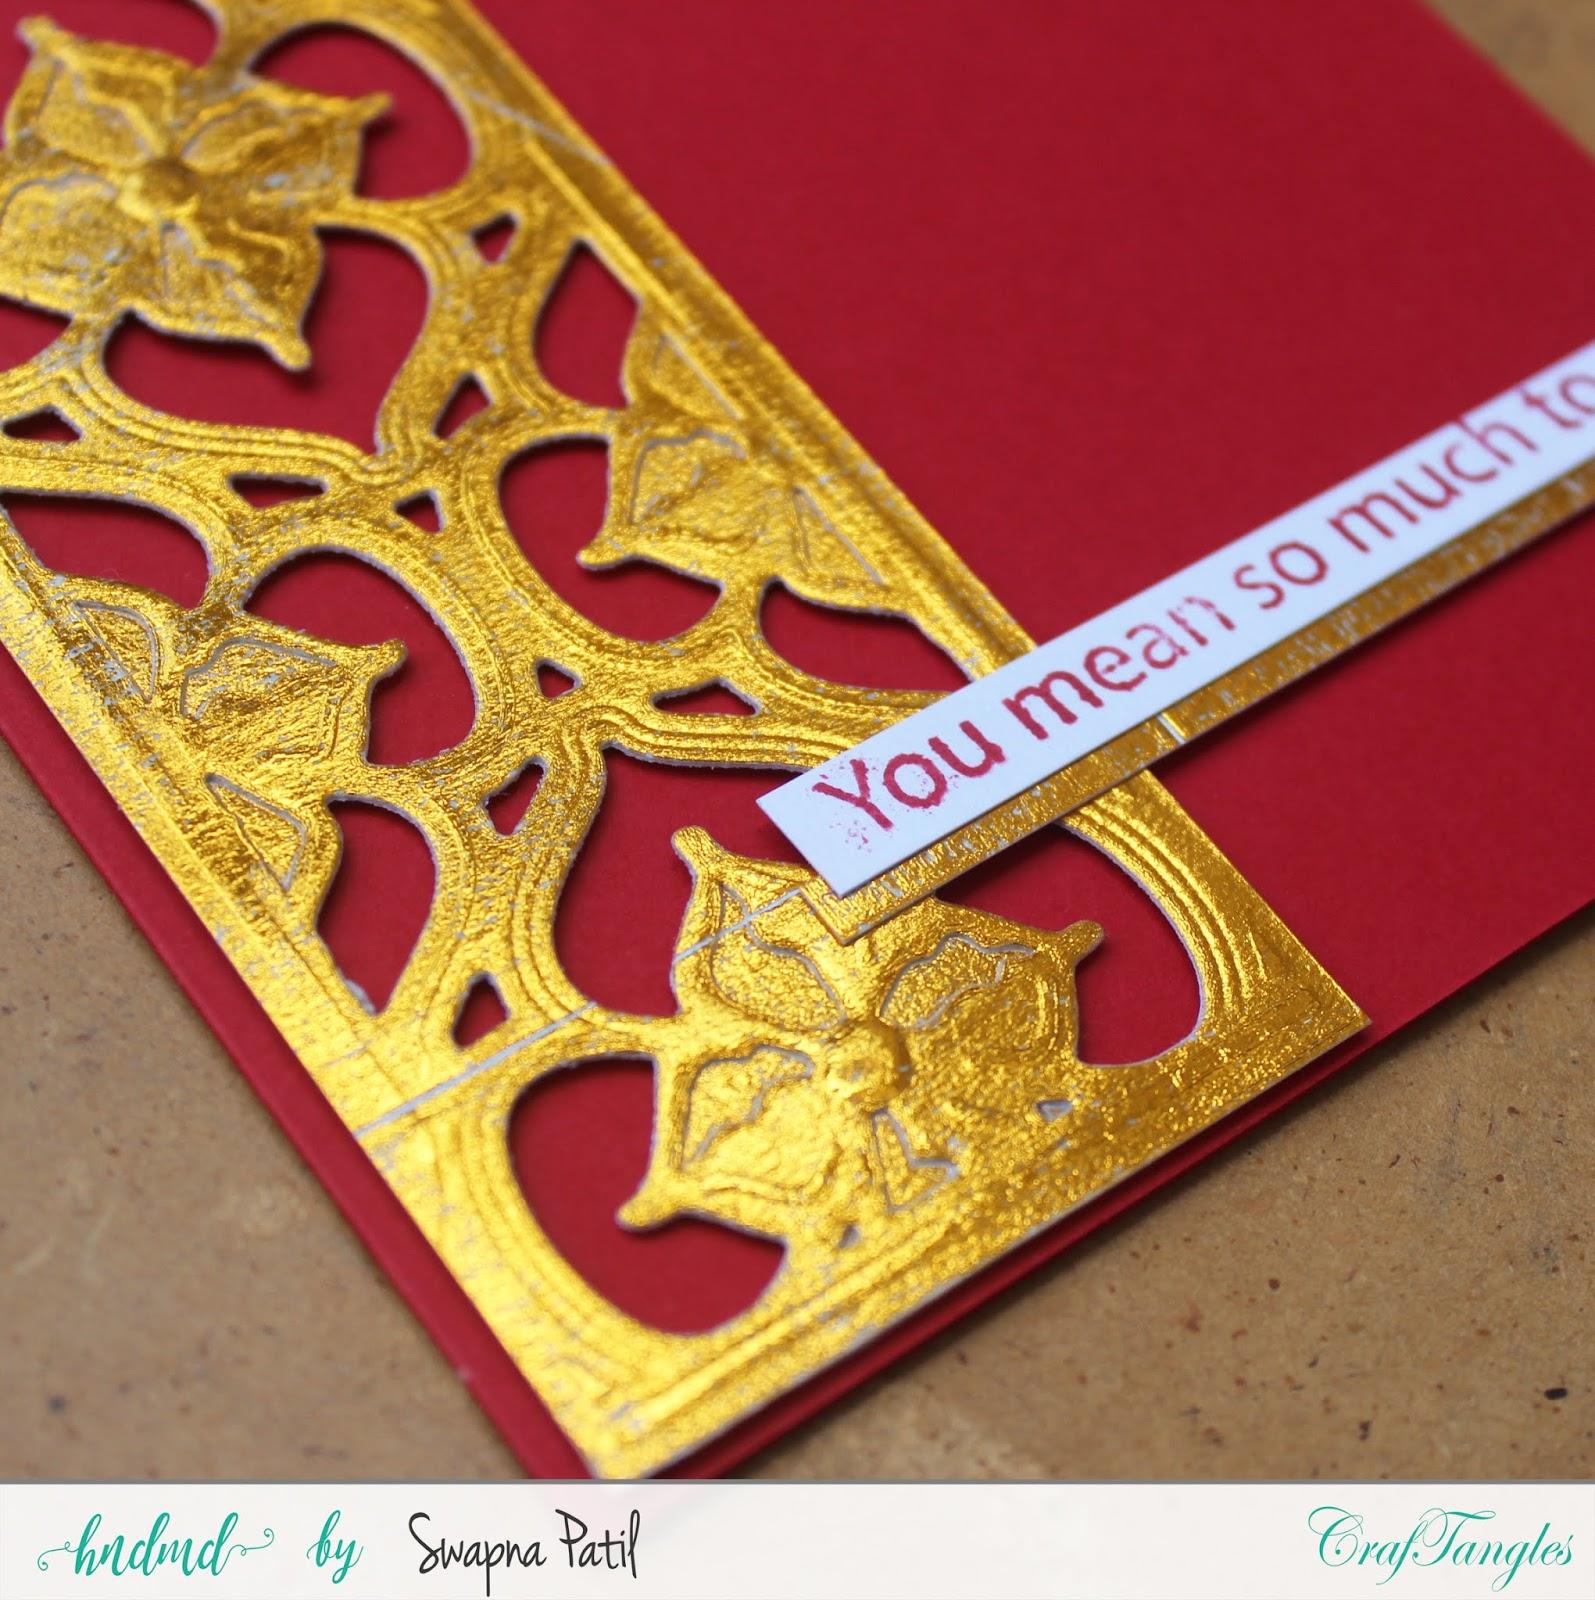 Foiled cards+Diecutting card 6